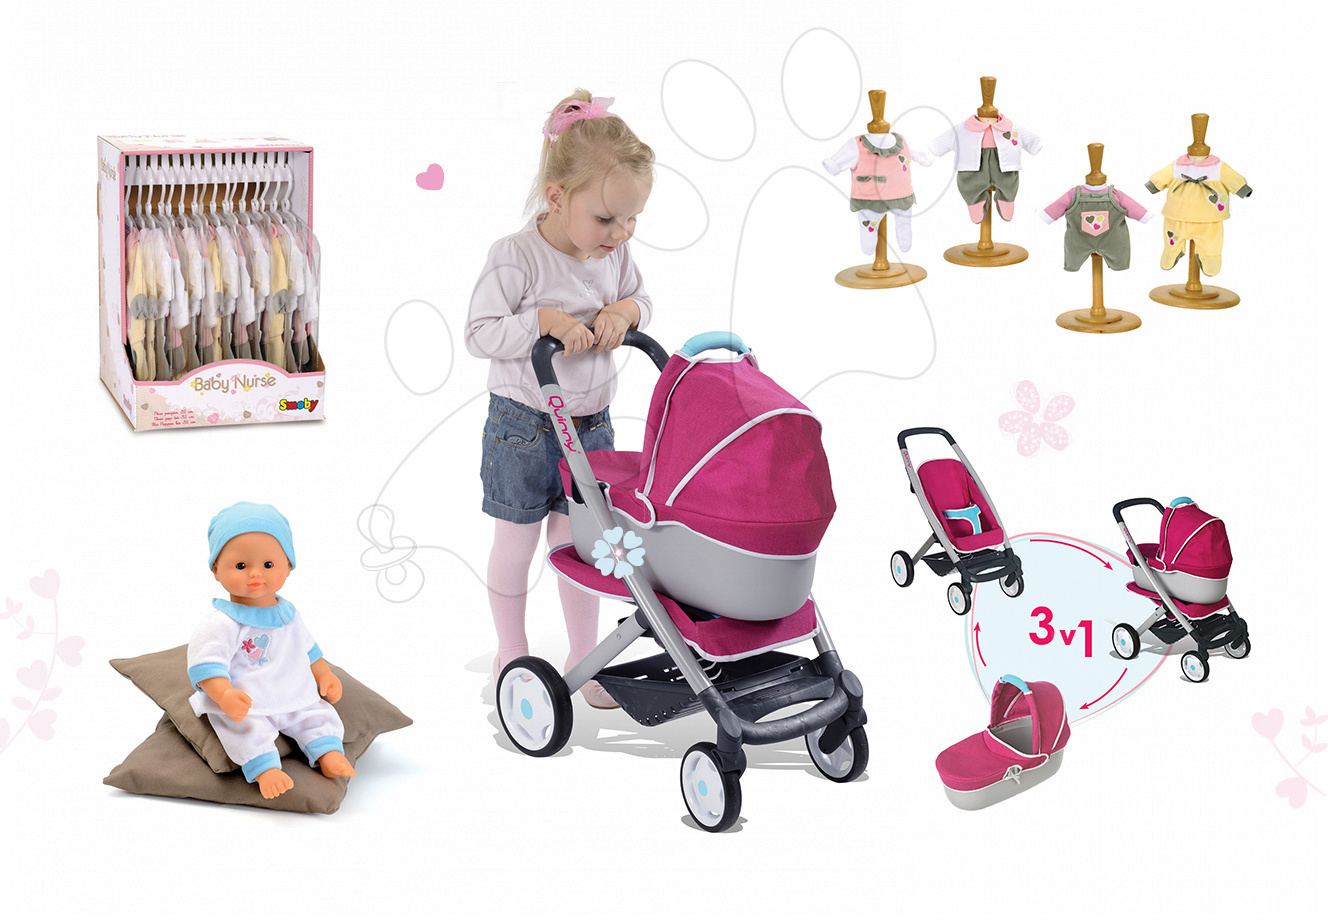 Set kočárek pro panenku Maxi Cosi & Quinny 3v1 Smoby a panenka Baby Nurse 32 cm a 3 šatičky